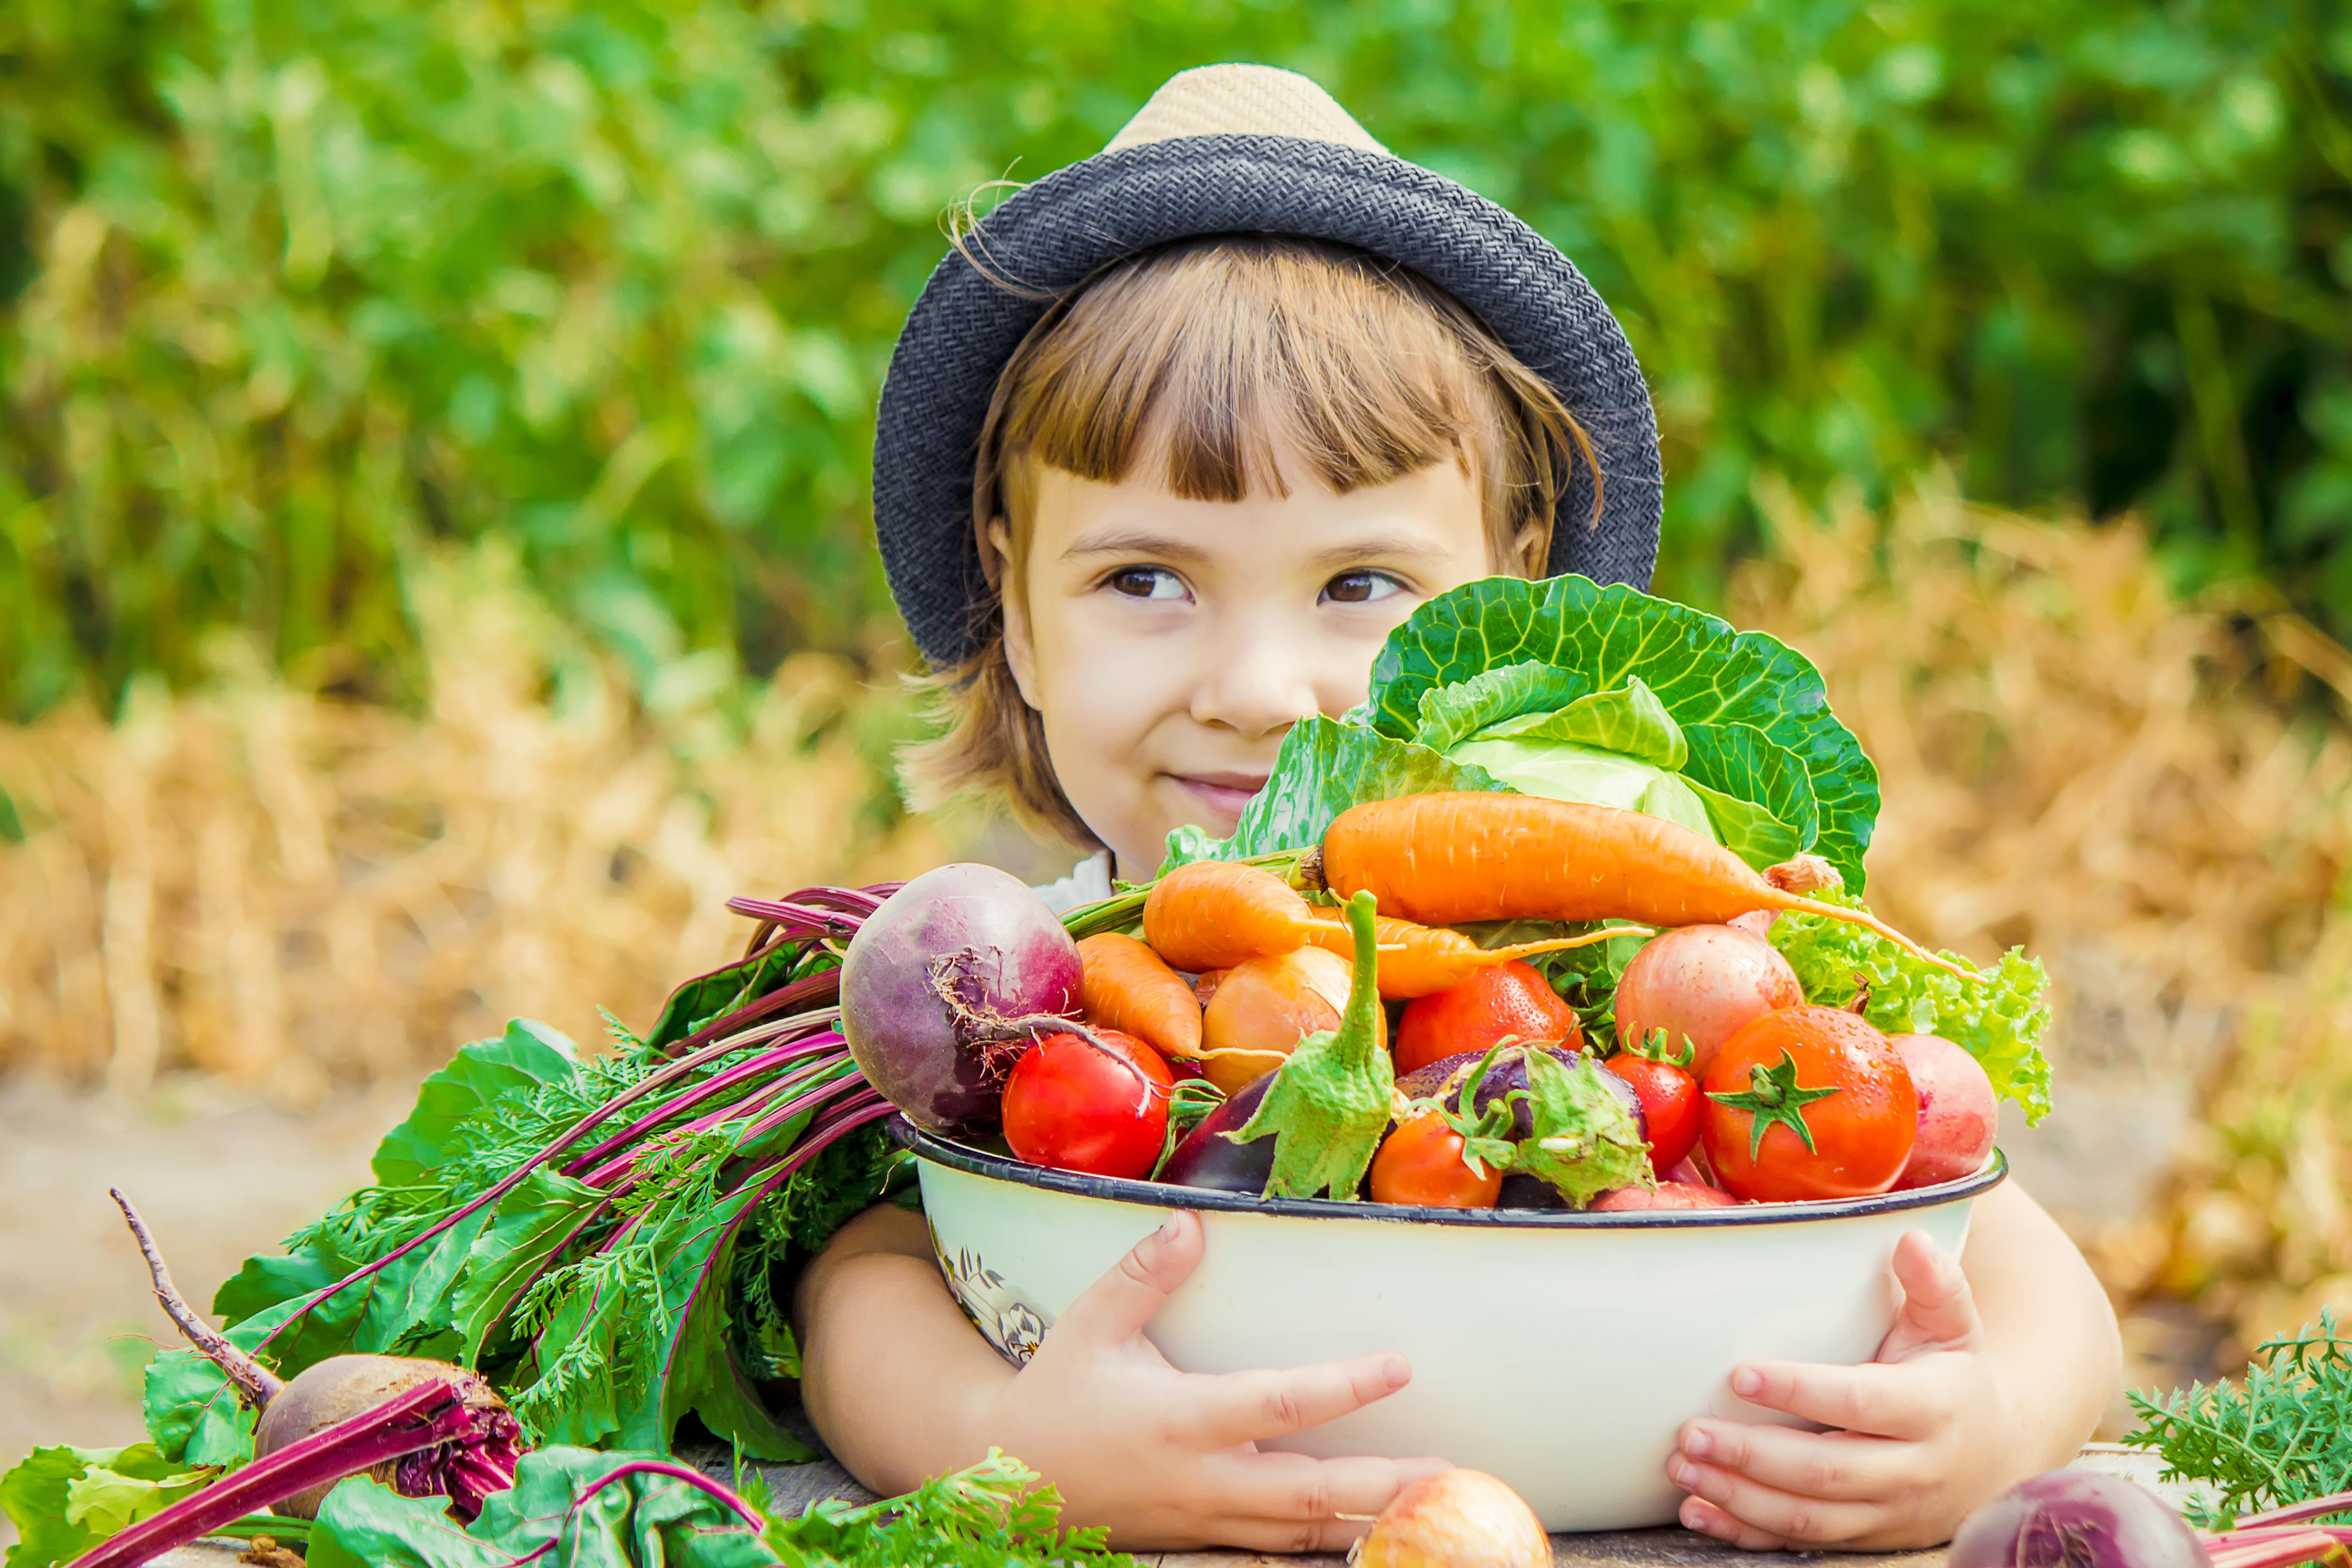 zdravy zivotni styl zdrava strava deti zelenina ovoce